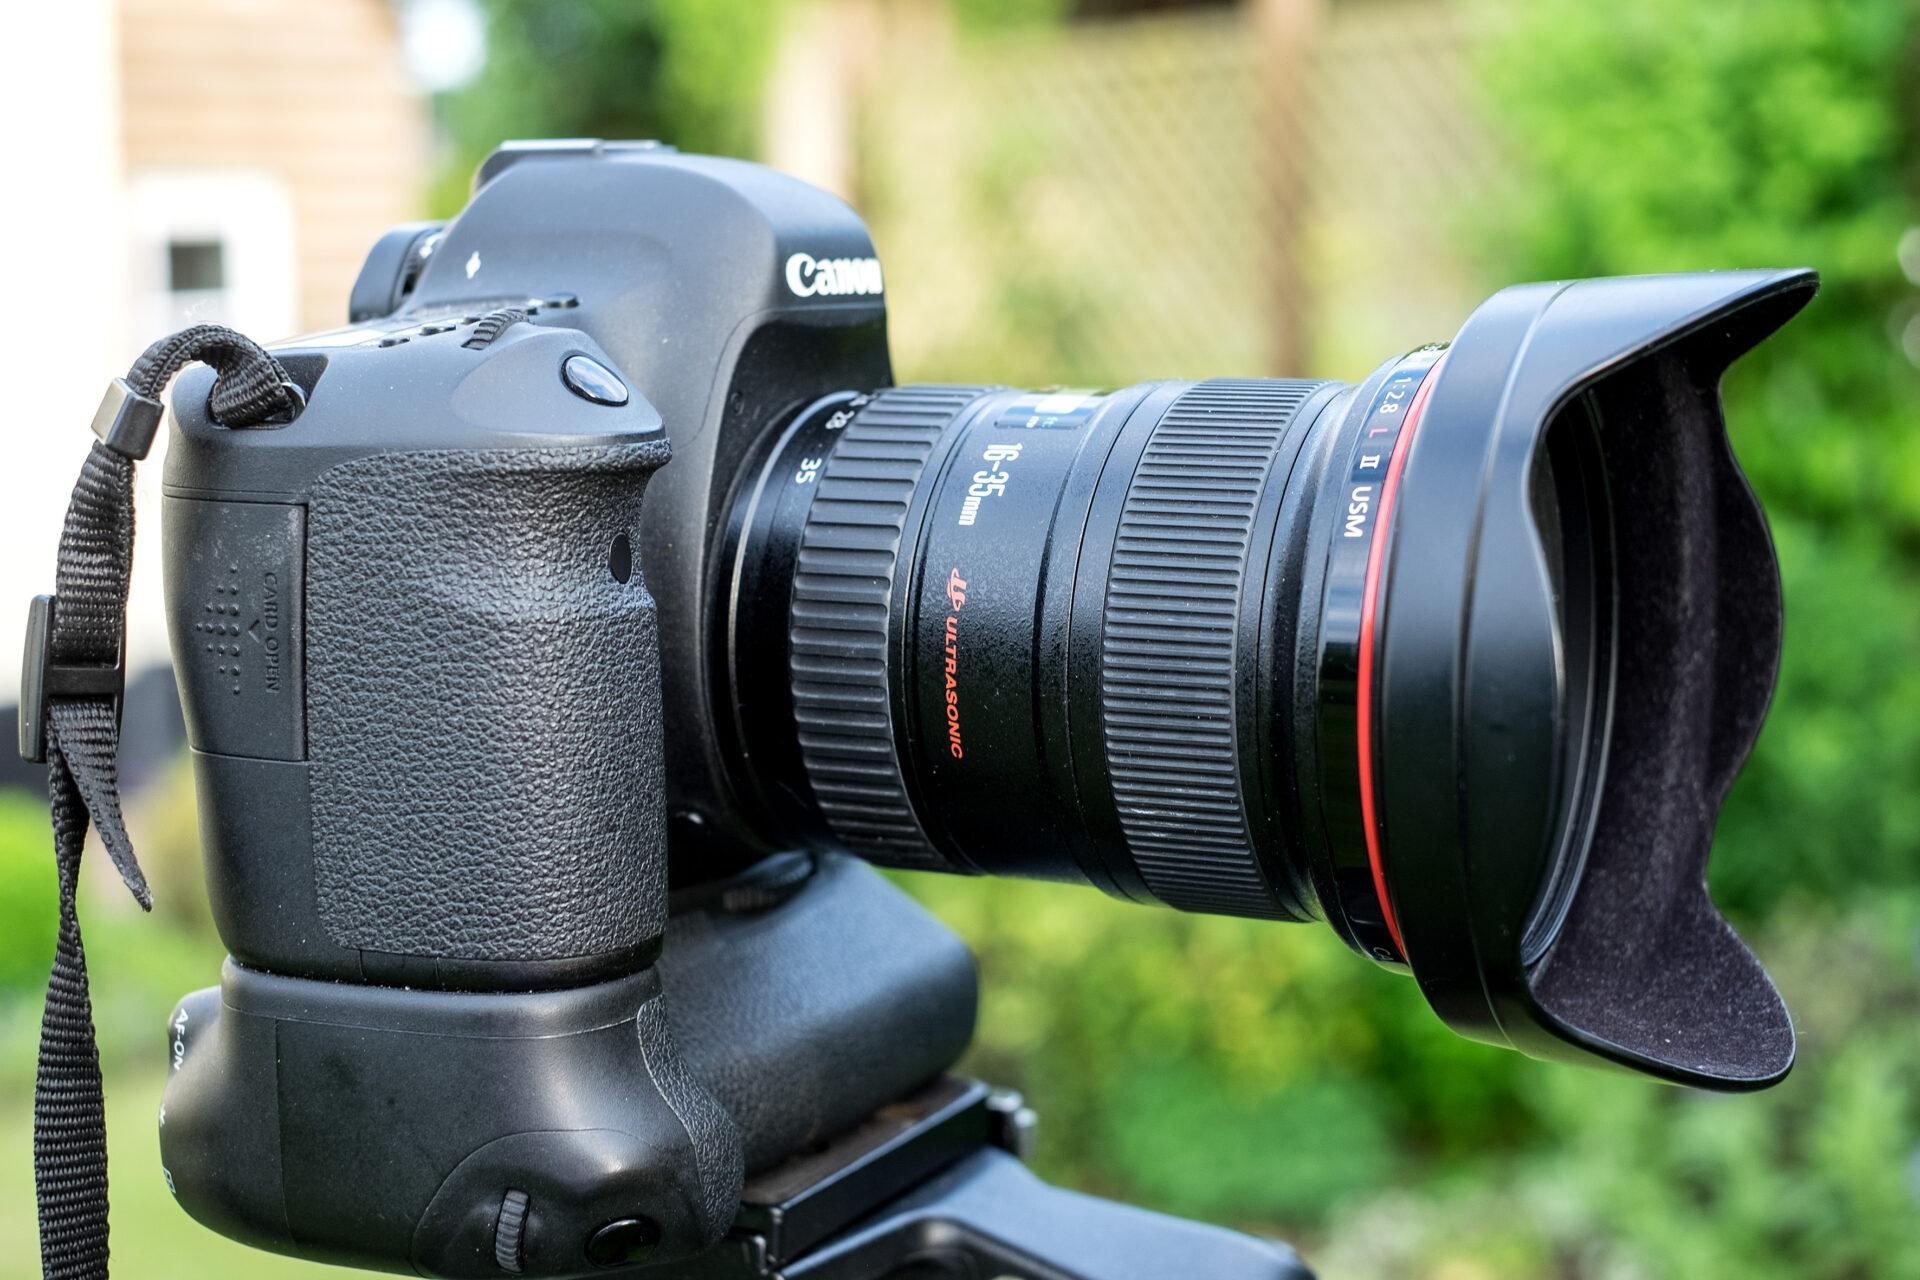 Canon 16-35mm f2.8 lens